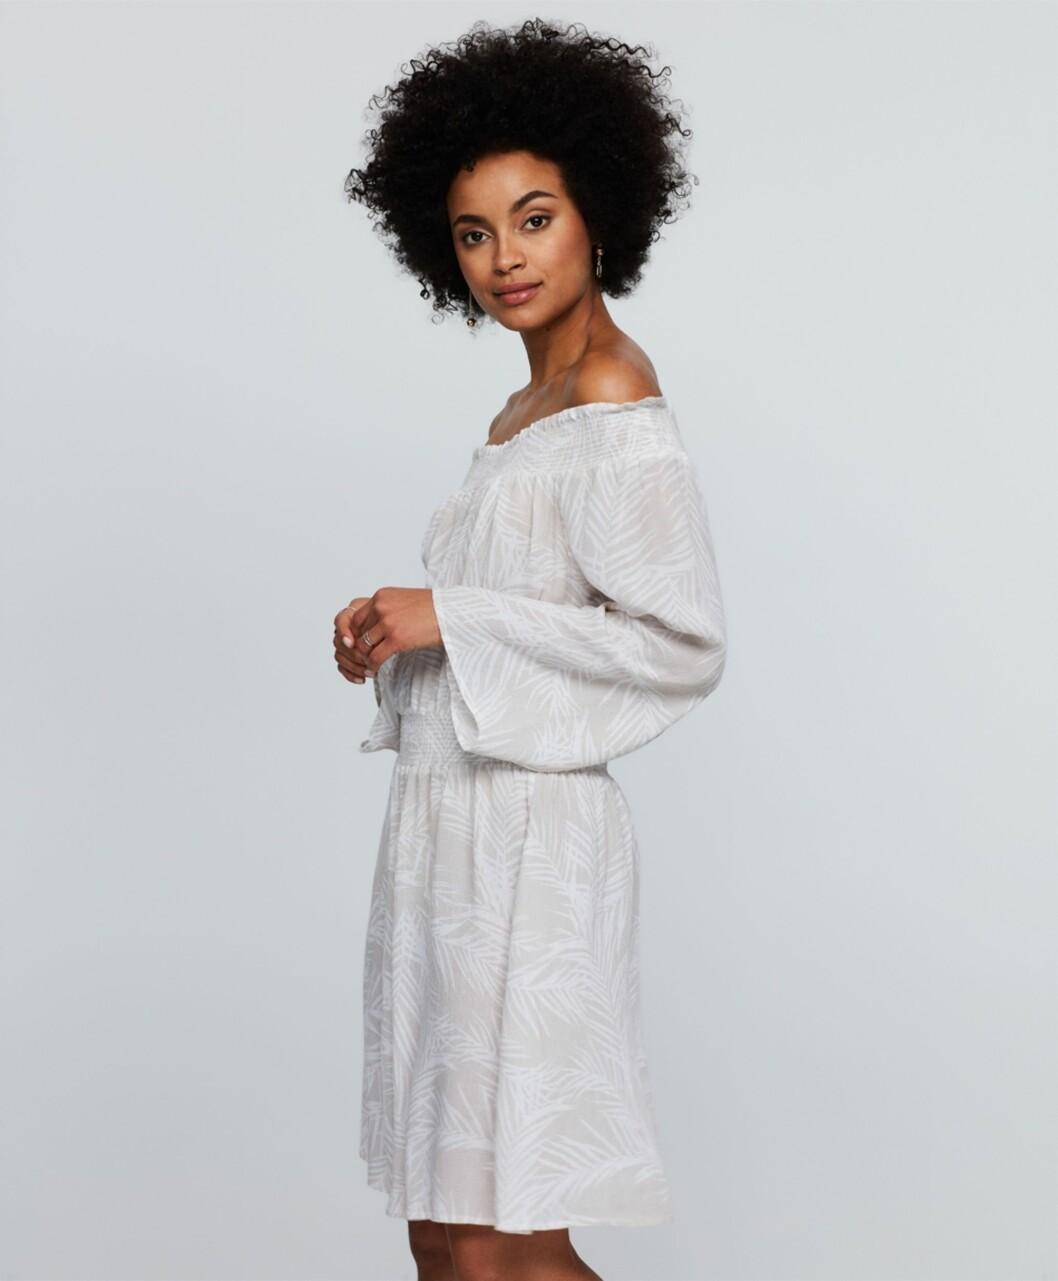 Kjole fra Gina Tricot   kr 299   http://www.ginatricot.com/cno/no/kolleksjon/se-alle-klar/kjoler/emma-off-shoulder-kjole/prod772761518.html?nosto=productcategory-nosto-1